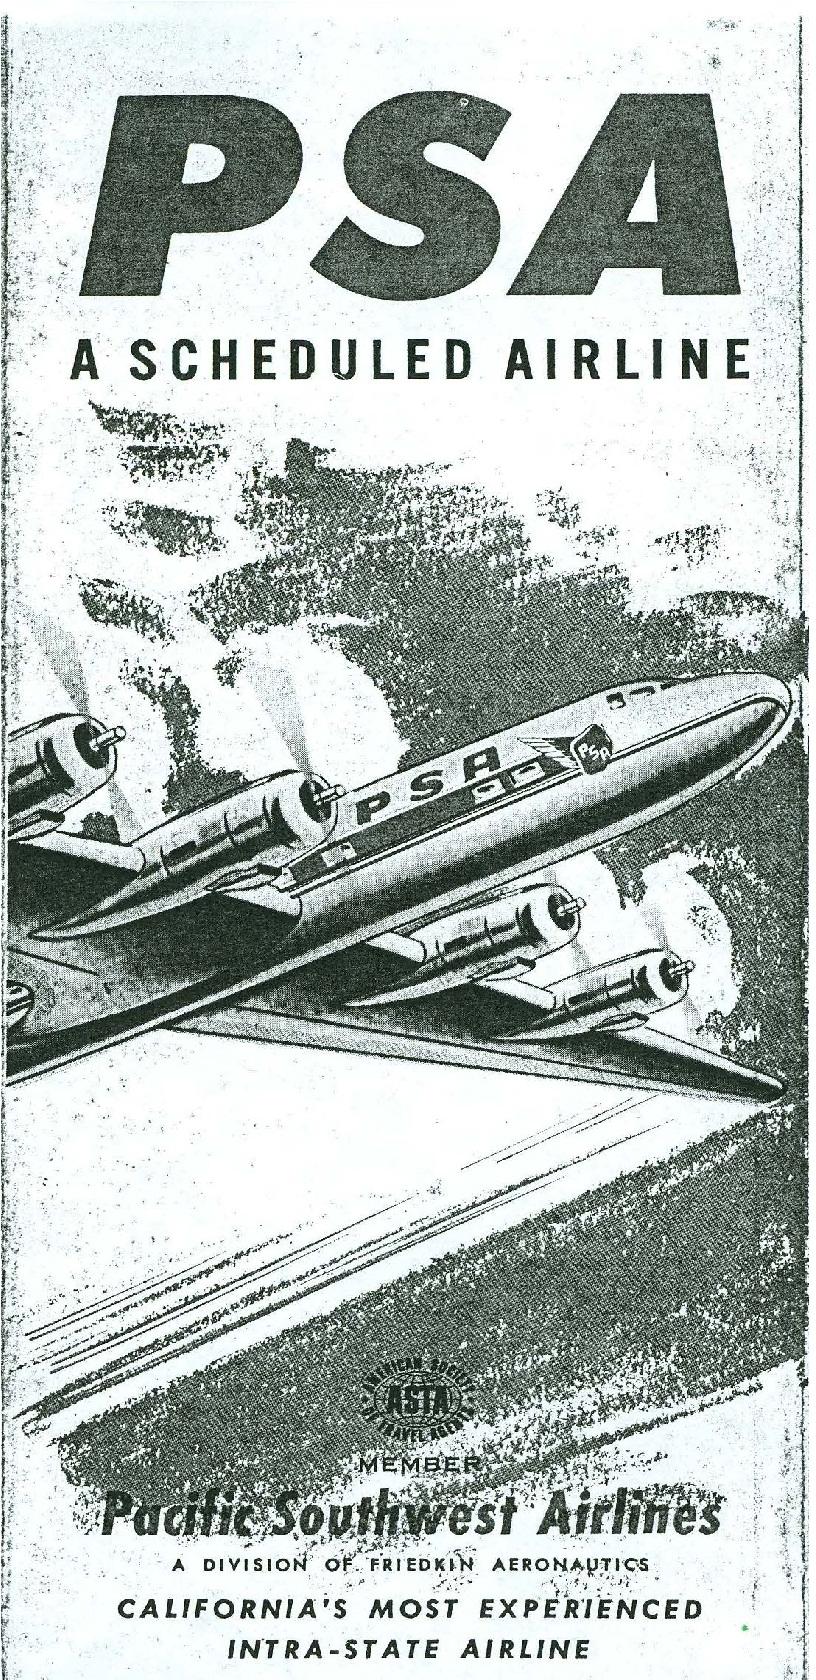 Aviation History Project